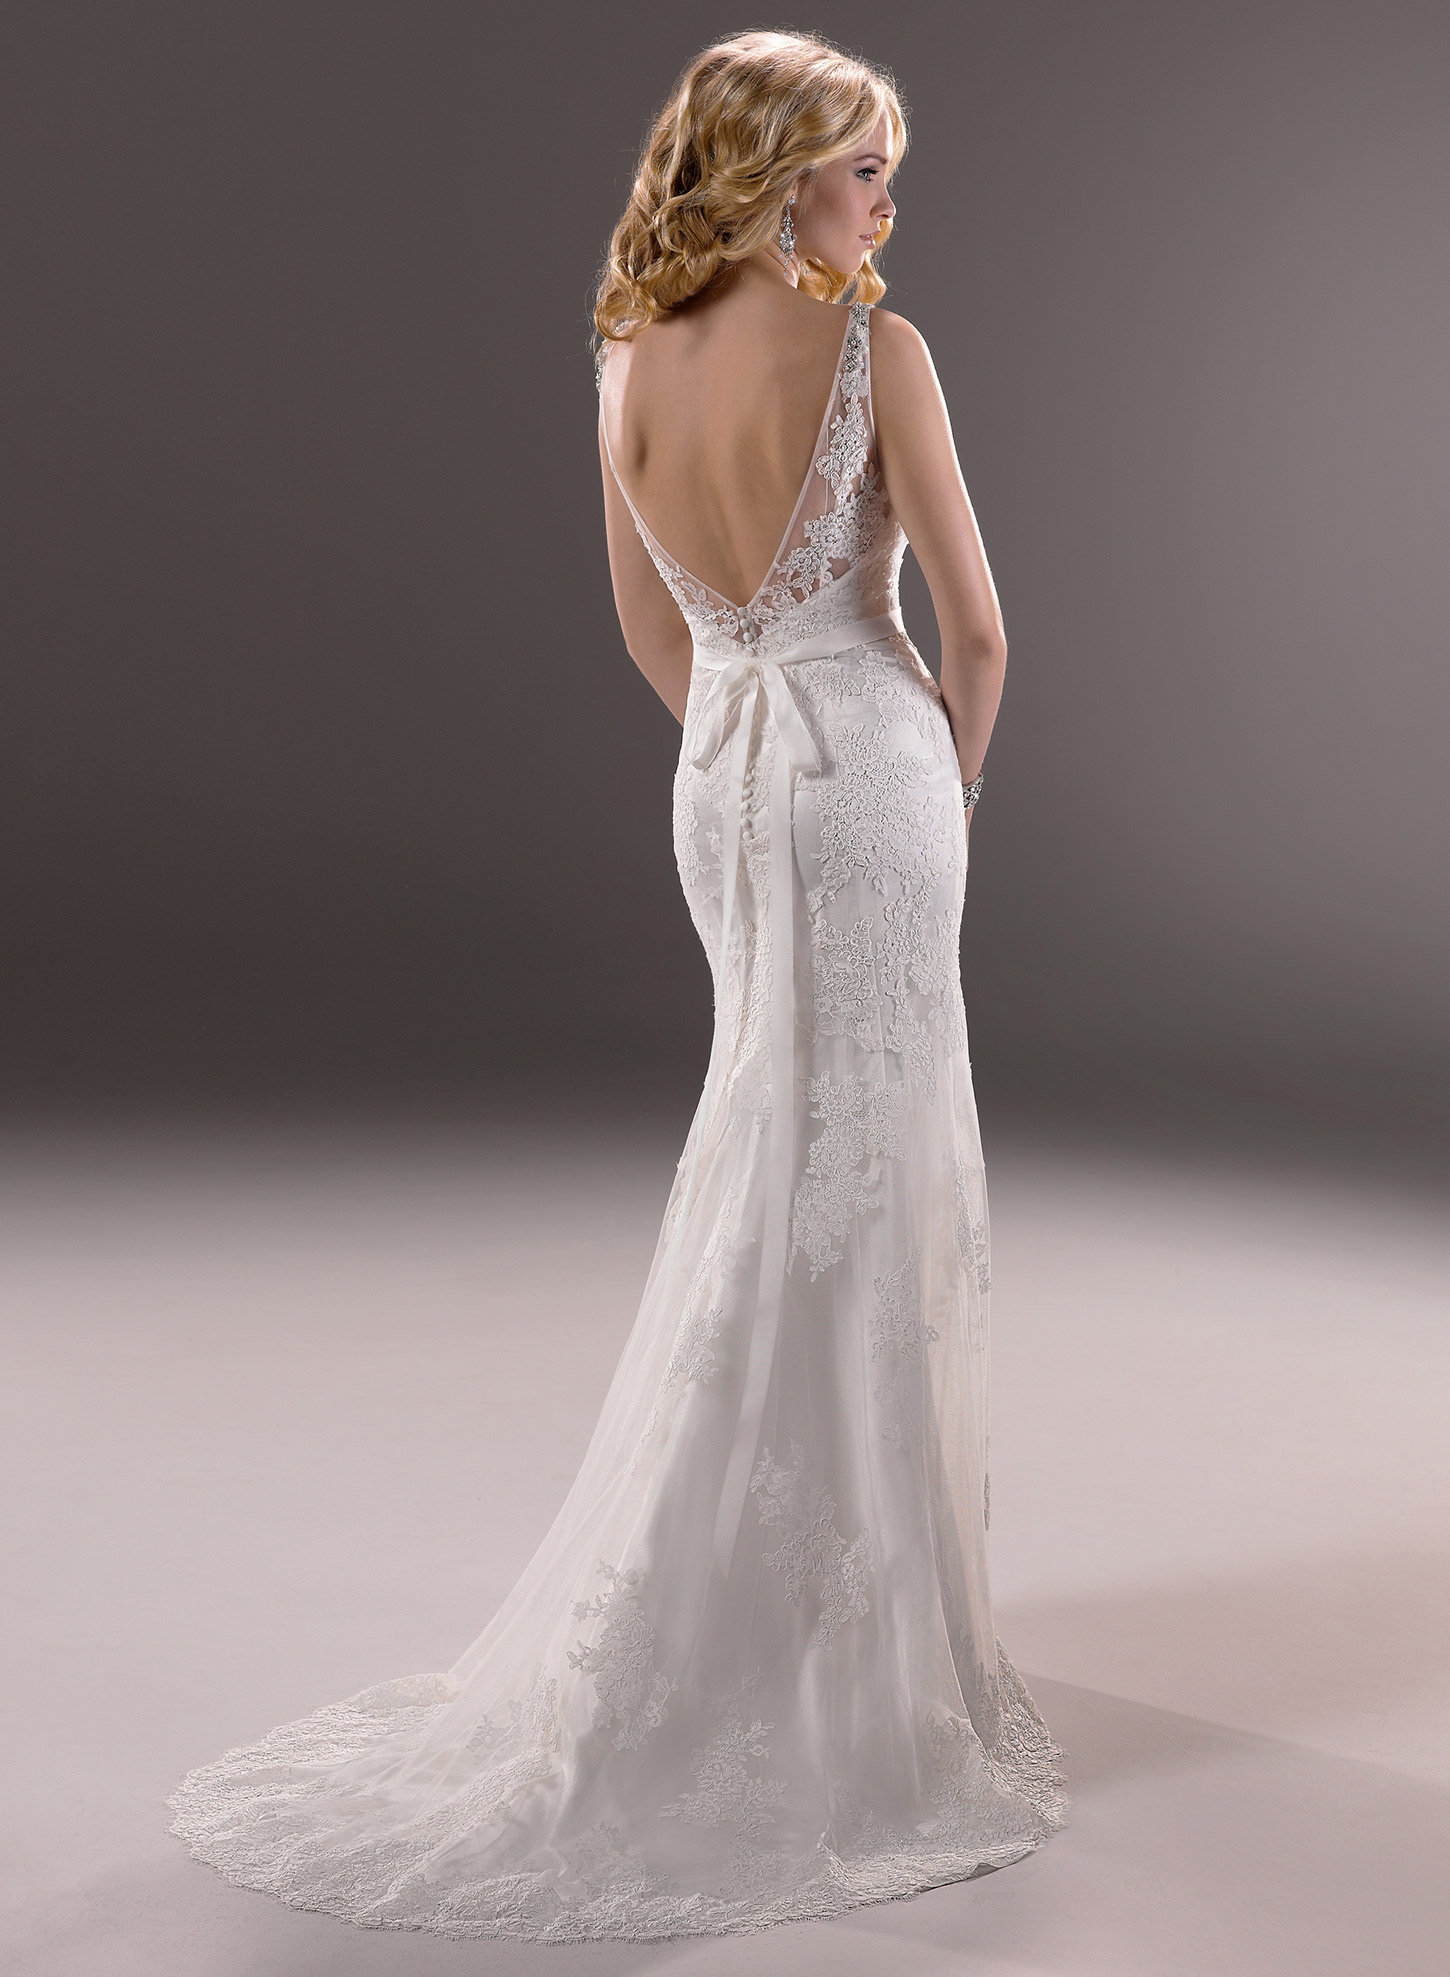 backless wedding dresses designer photo - 1